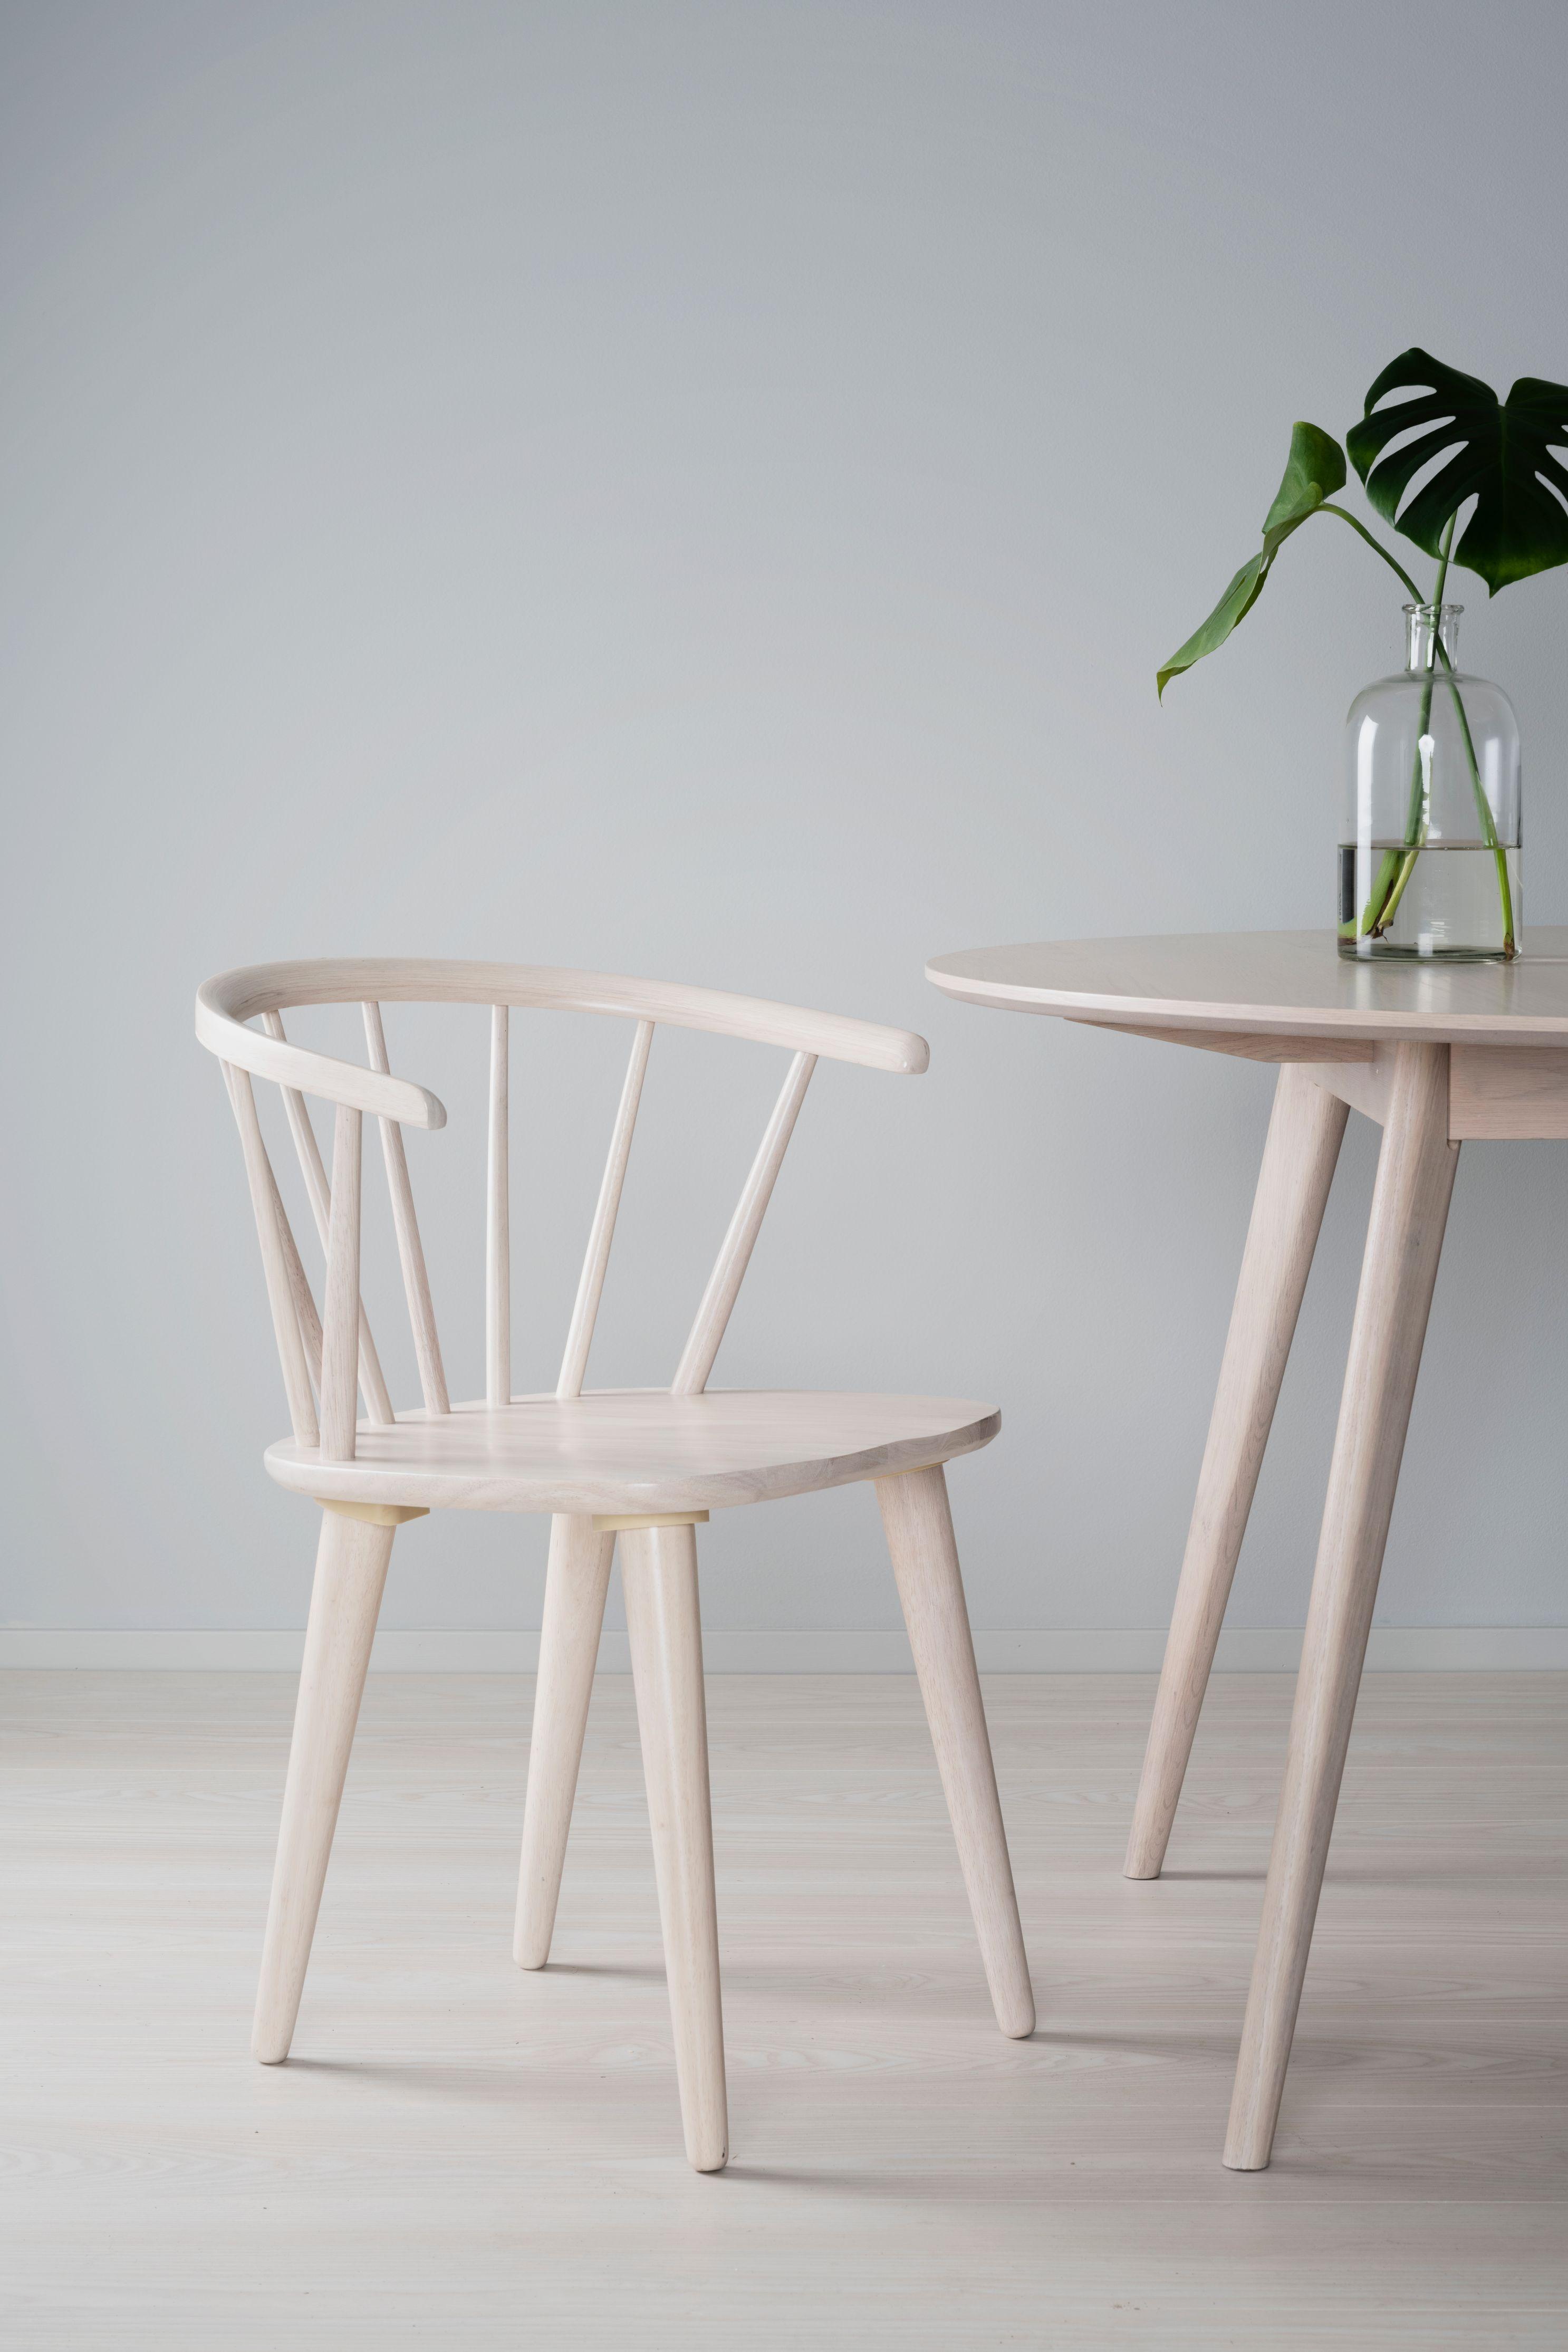 DAWSONE Carmen Whitewash Chair